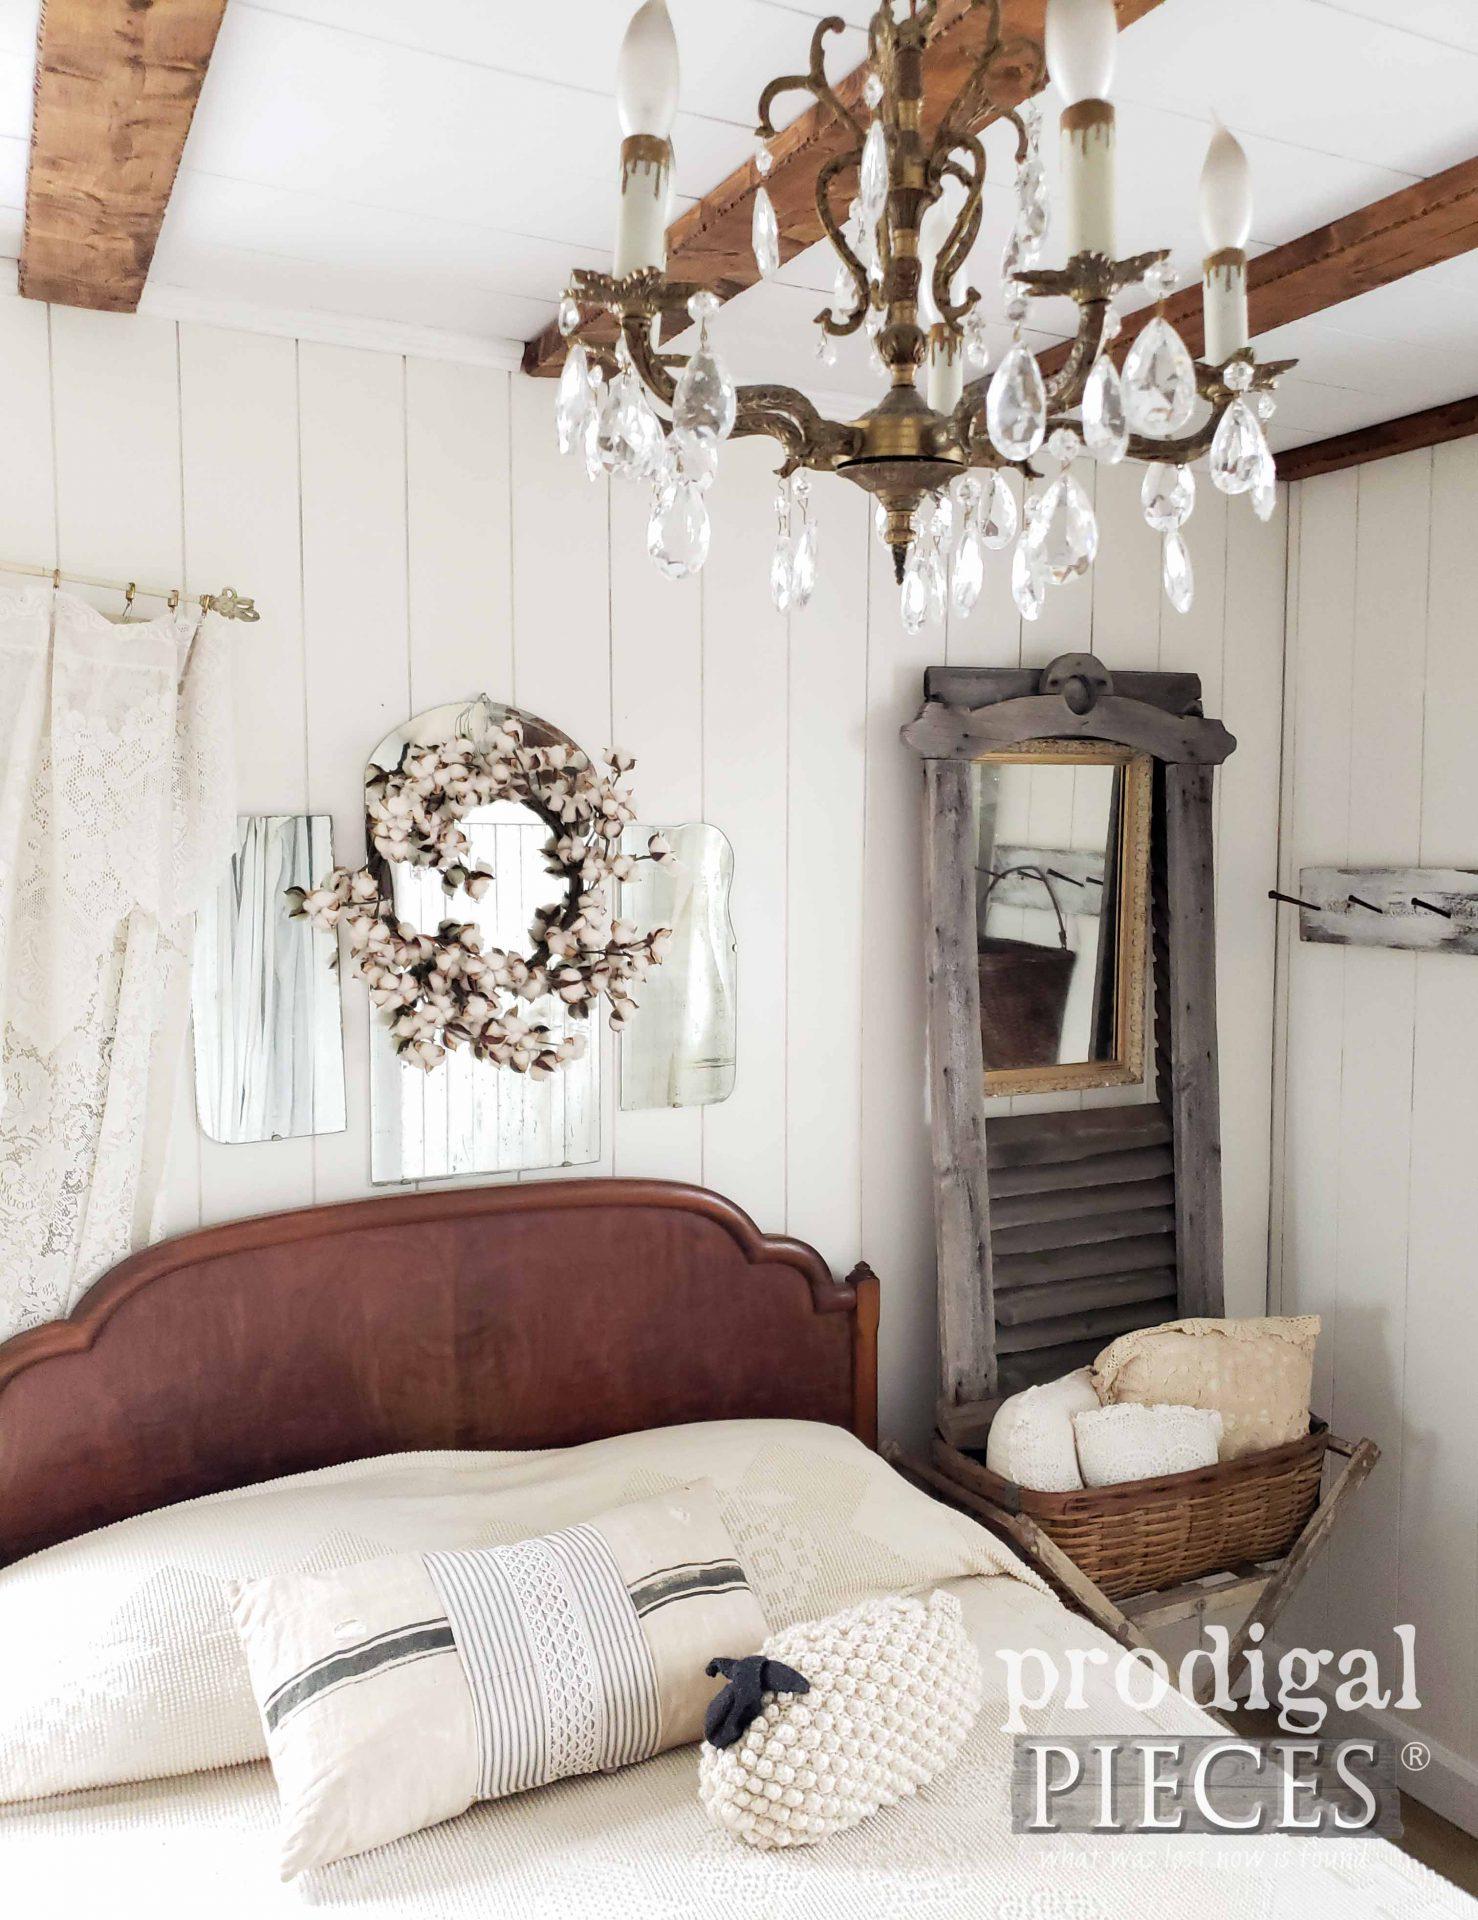 Antique Salvaged Farmhouse Home Decor by Larissa of Prodigal Pieces | prodigalpieces.com #prodigalpieces #farmhouse #home #bedroom #homedecor